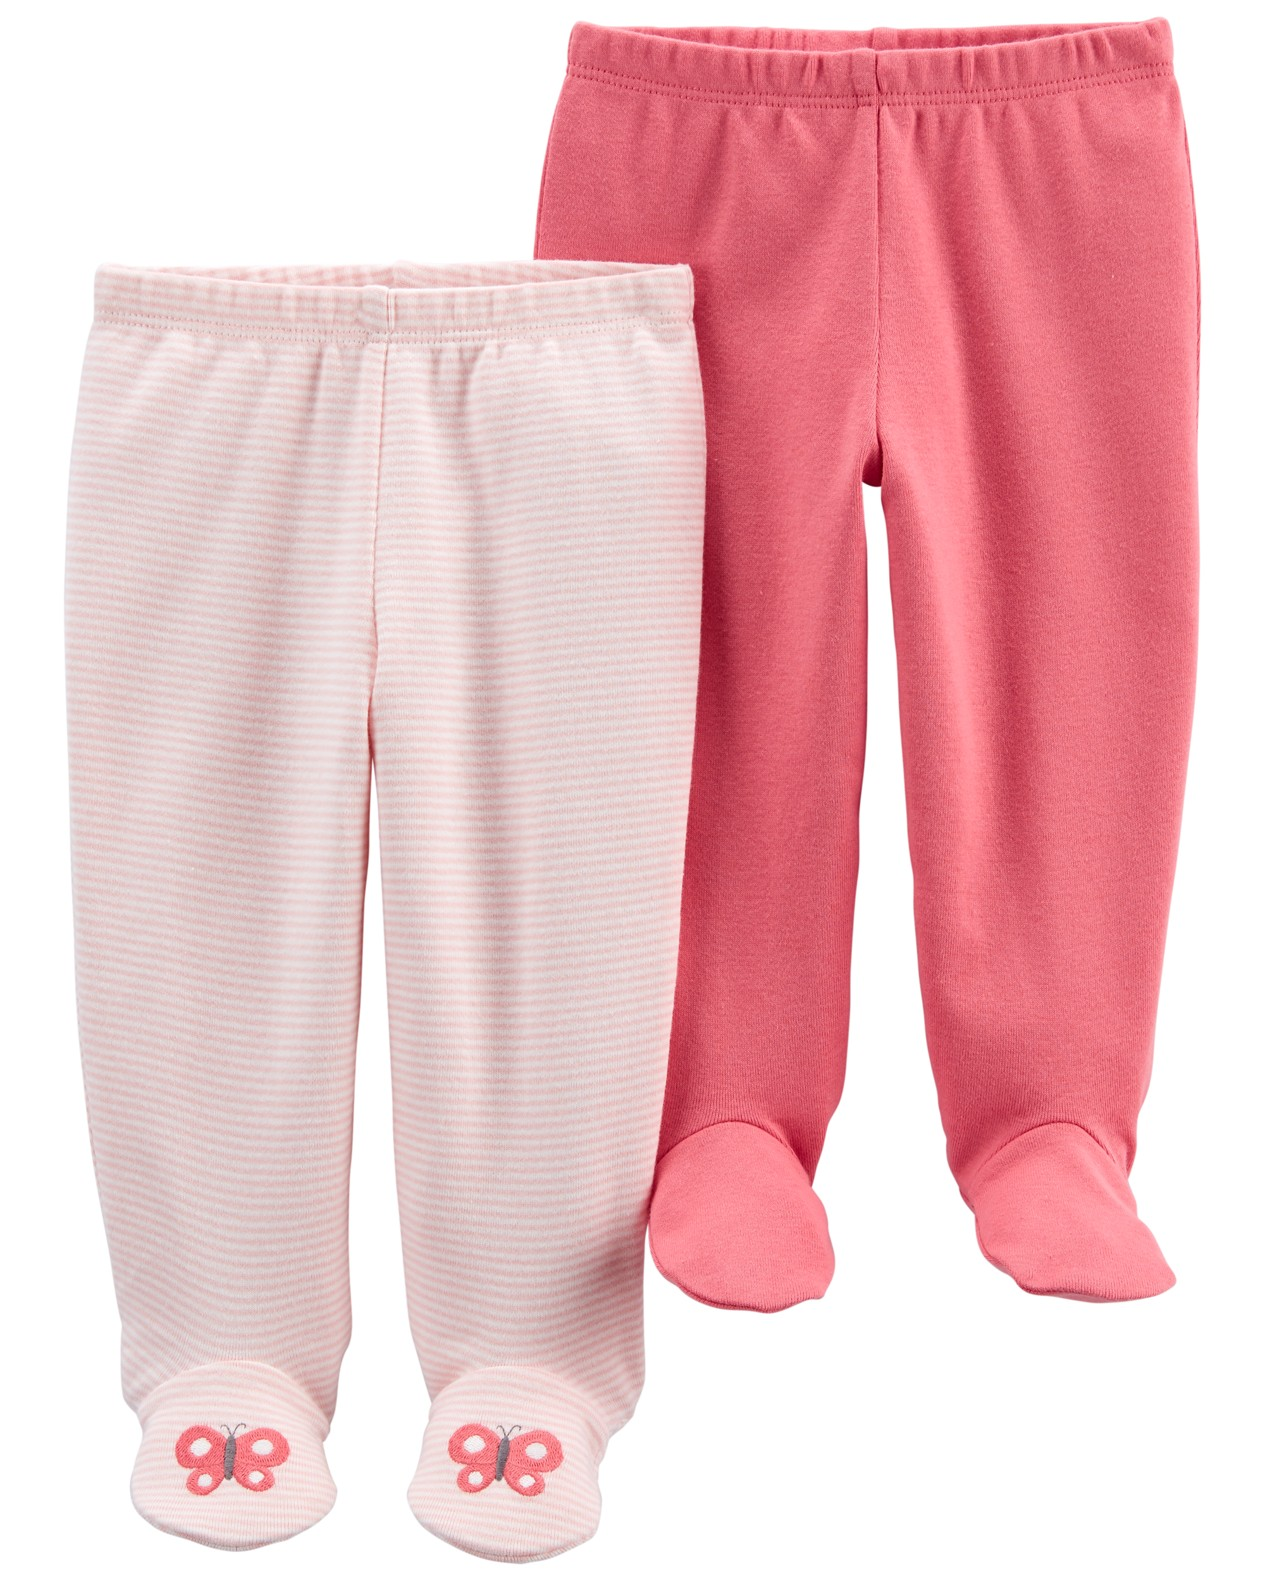 CARTER'S Polodupačky Pink dievča LBB 2ks 3m, veľ. 62